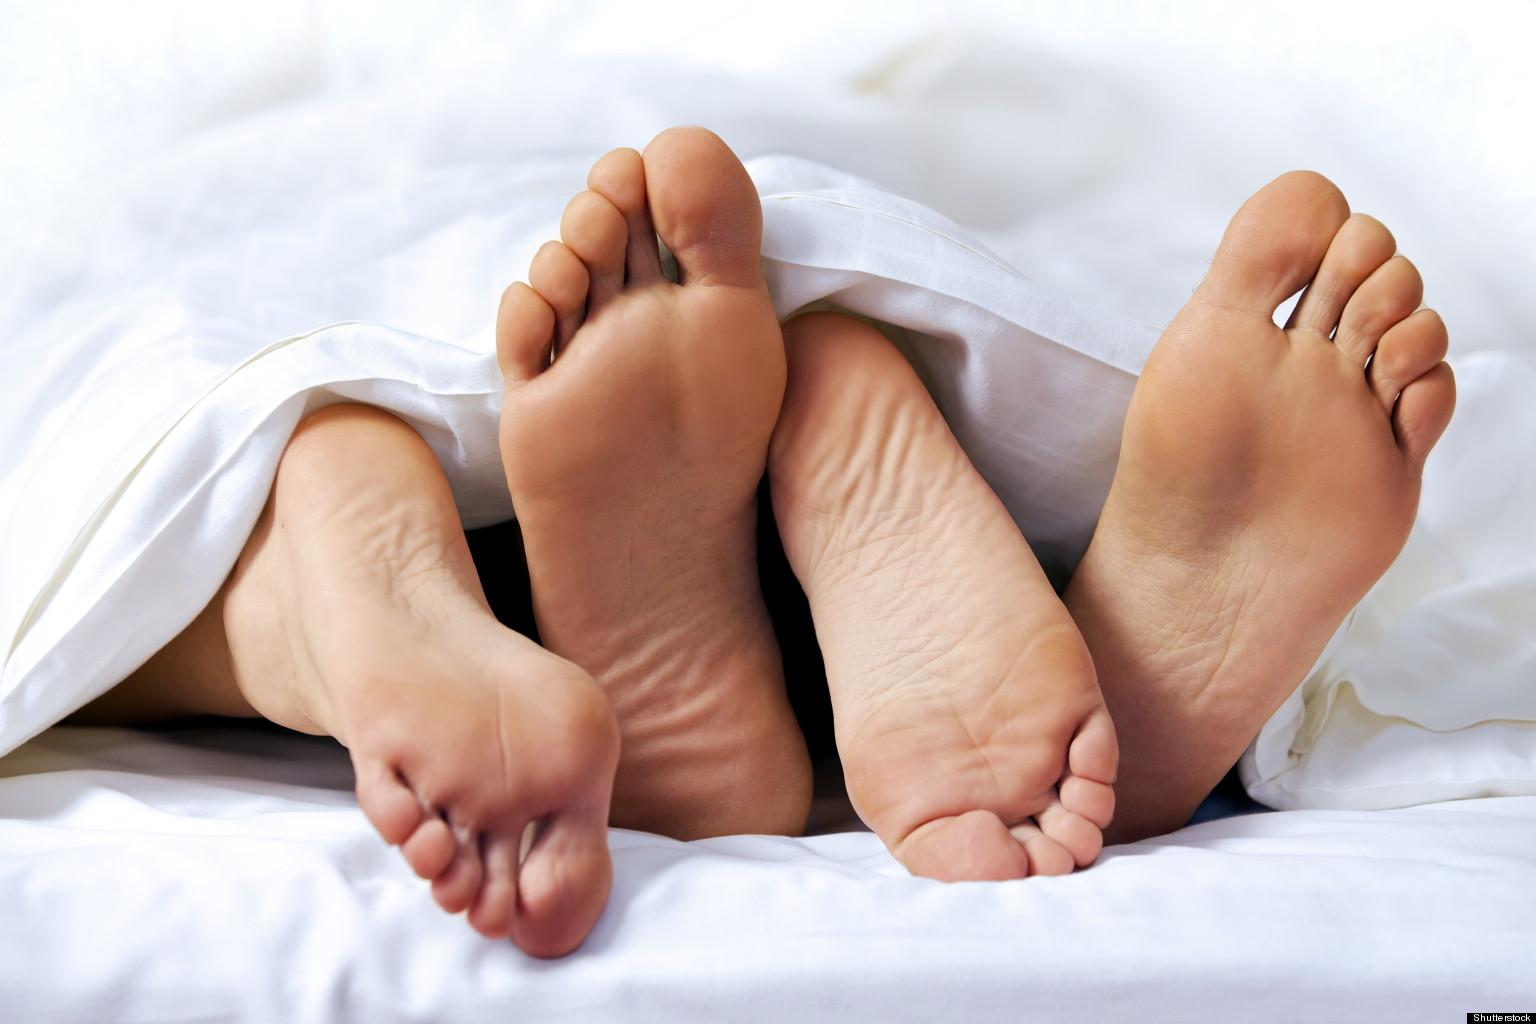 Sex after divorce christian